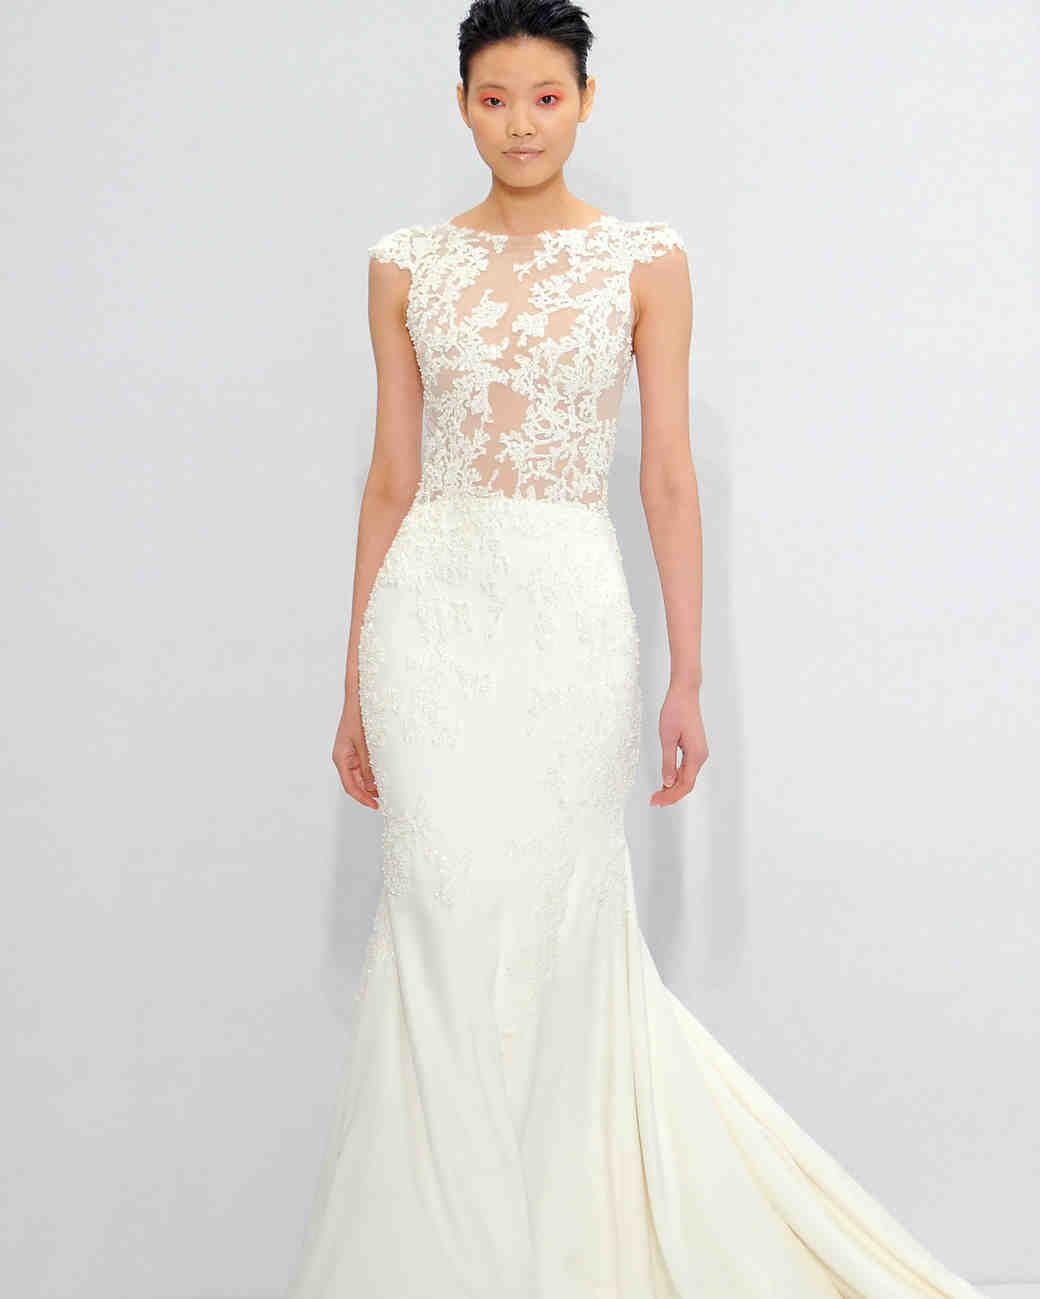 Mark Zunino For Kleinfeld Fall 2017 Wedding Dress Collection | Mark ...